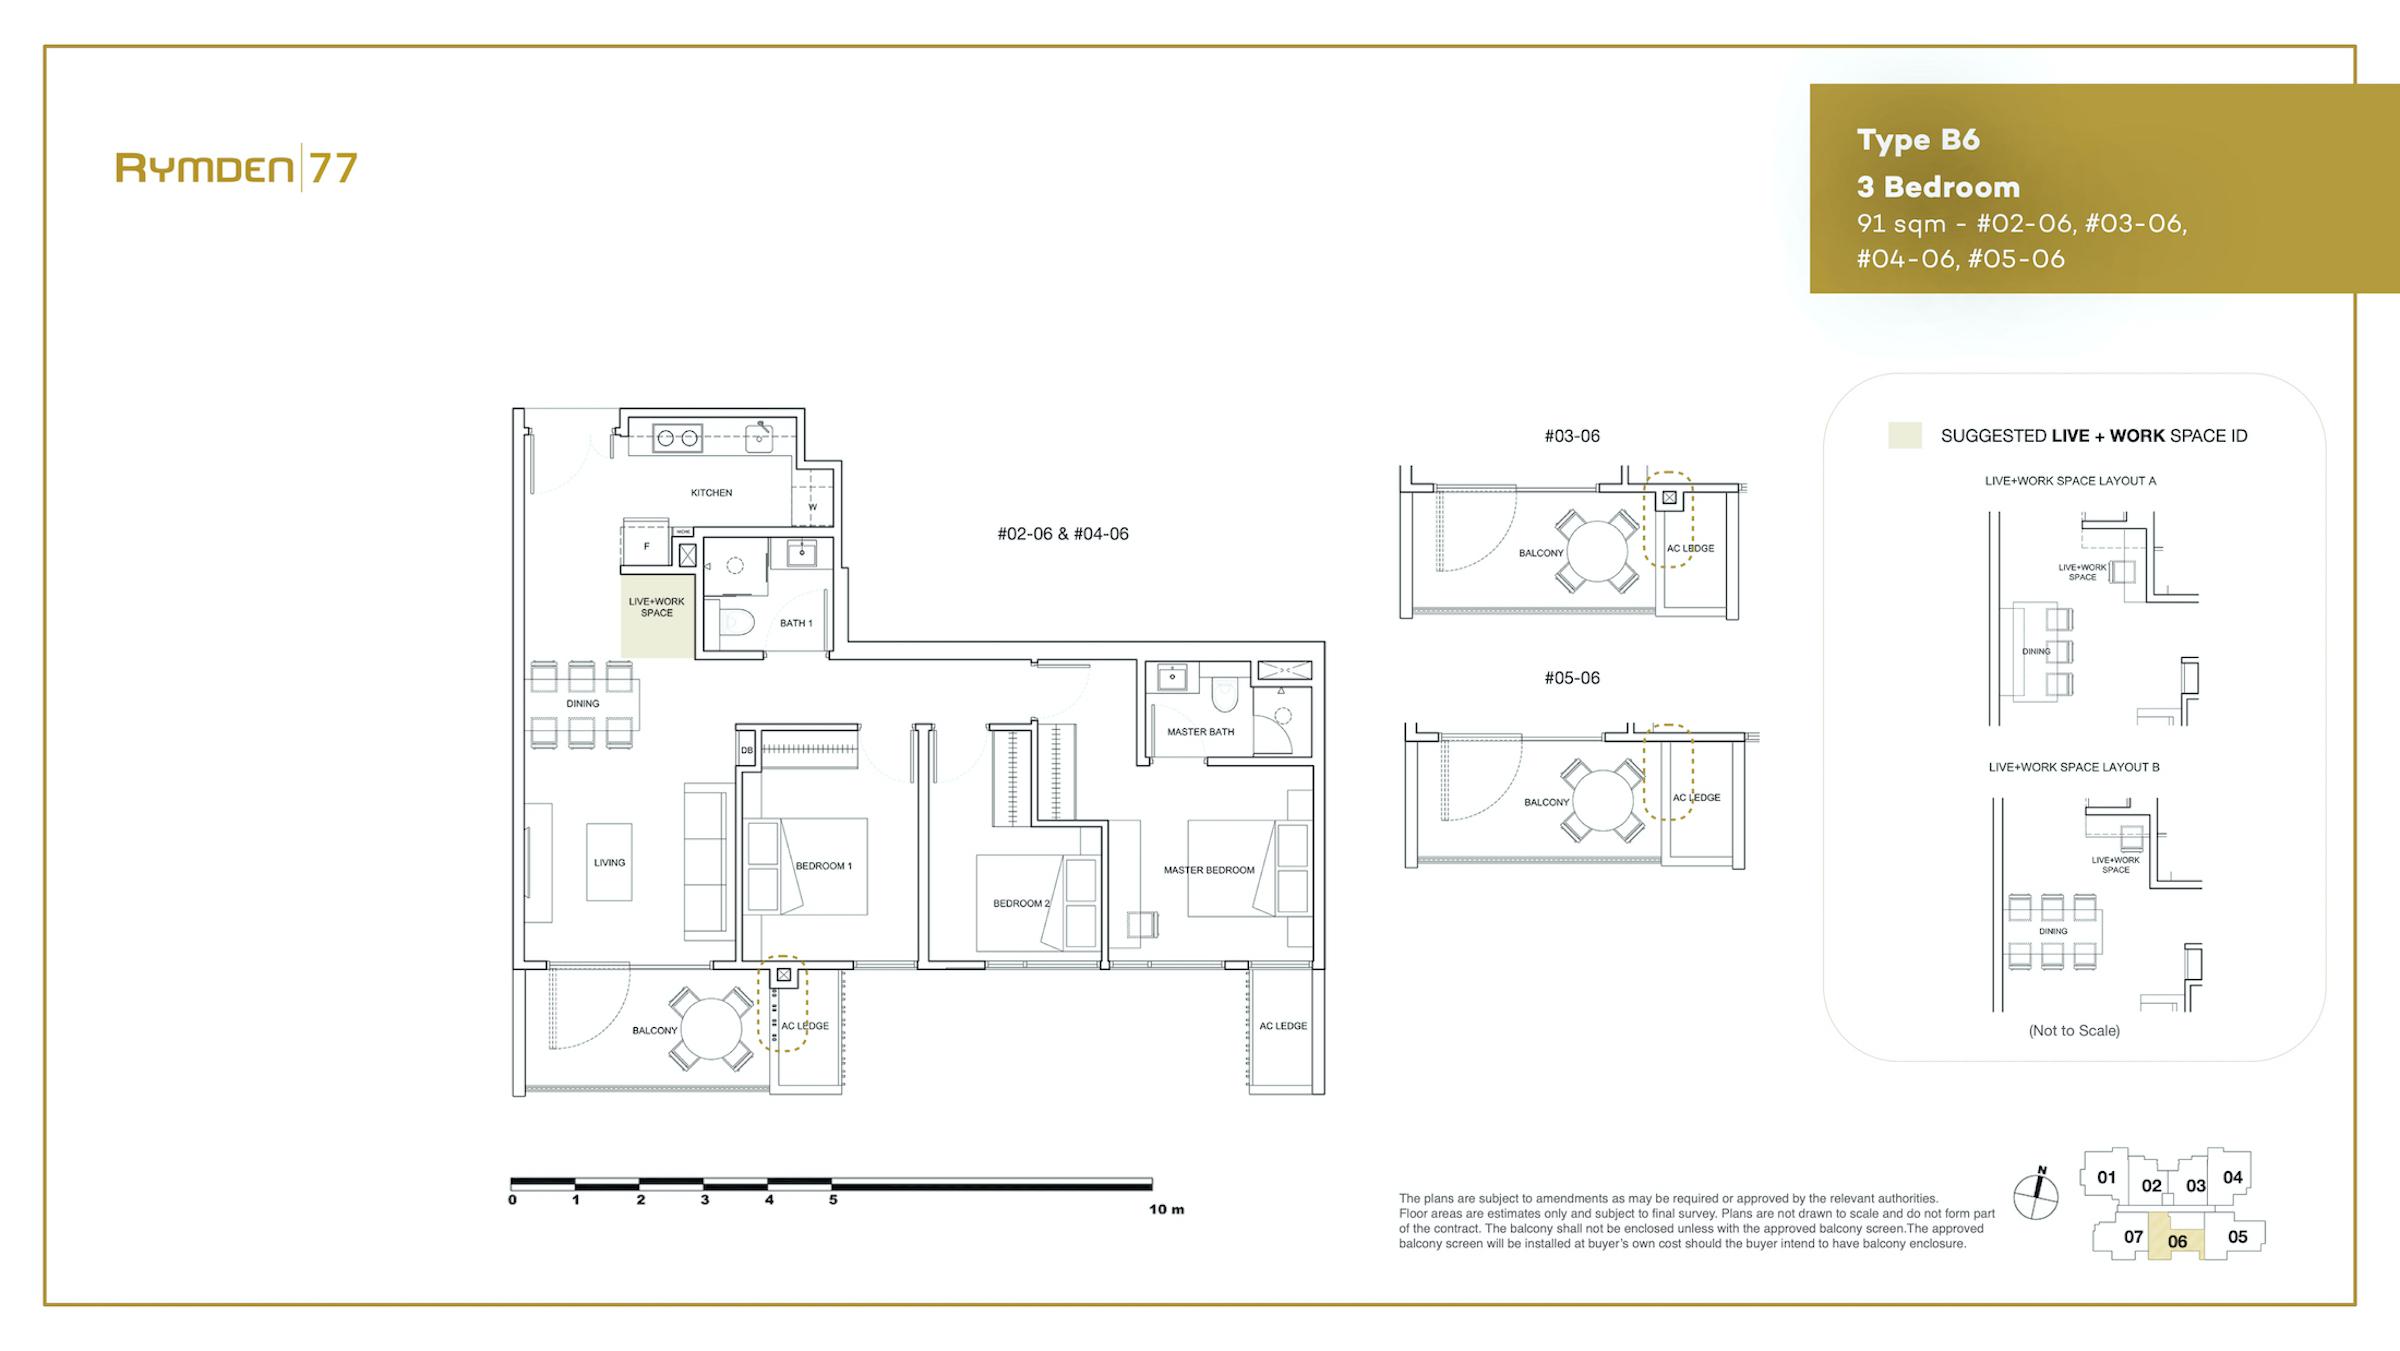 Rymden-77_3 Bedroom_Type B6.jpg